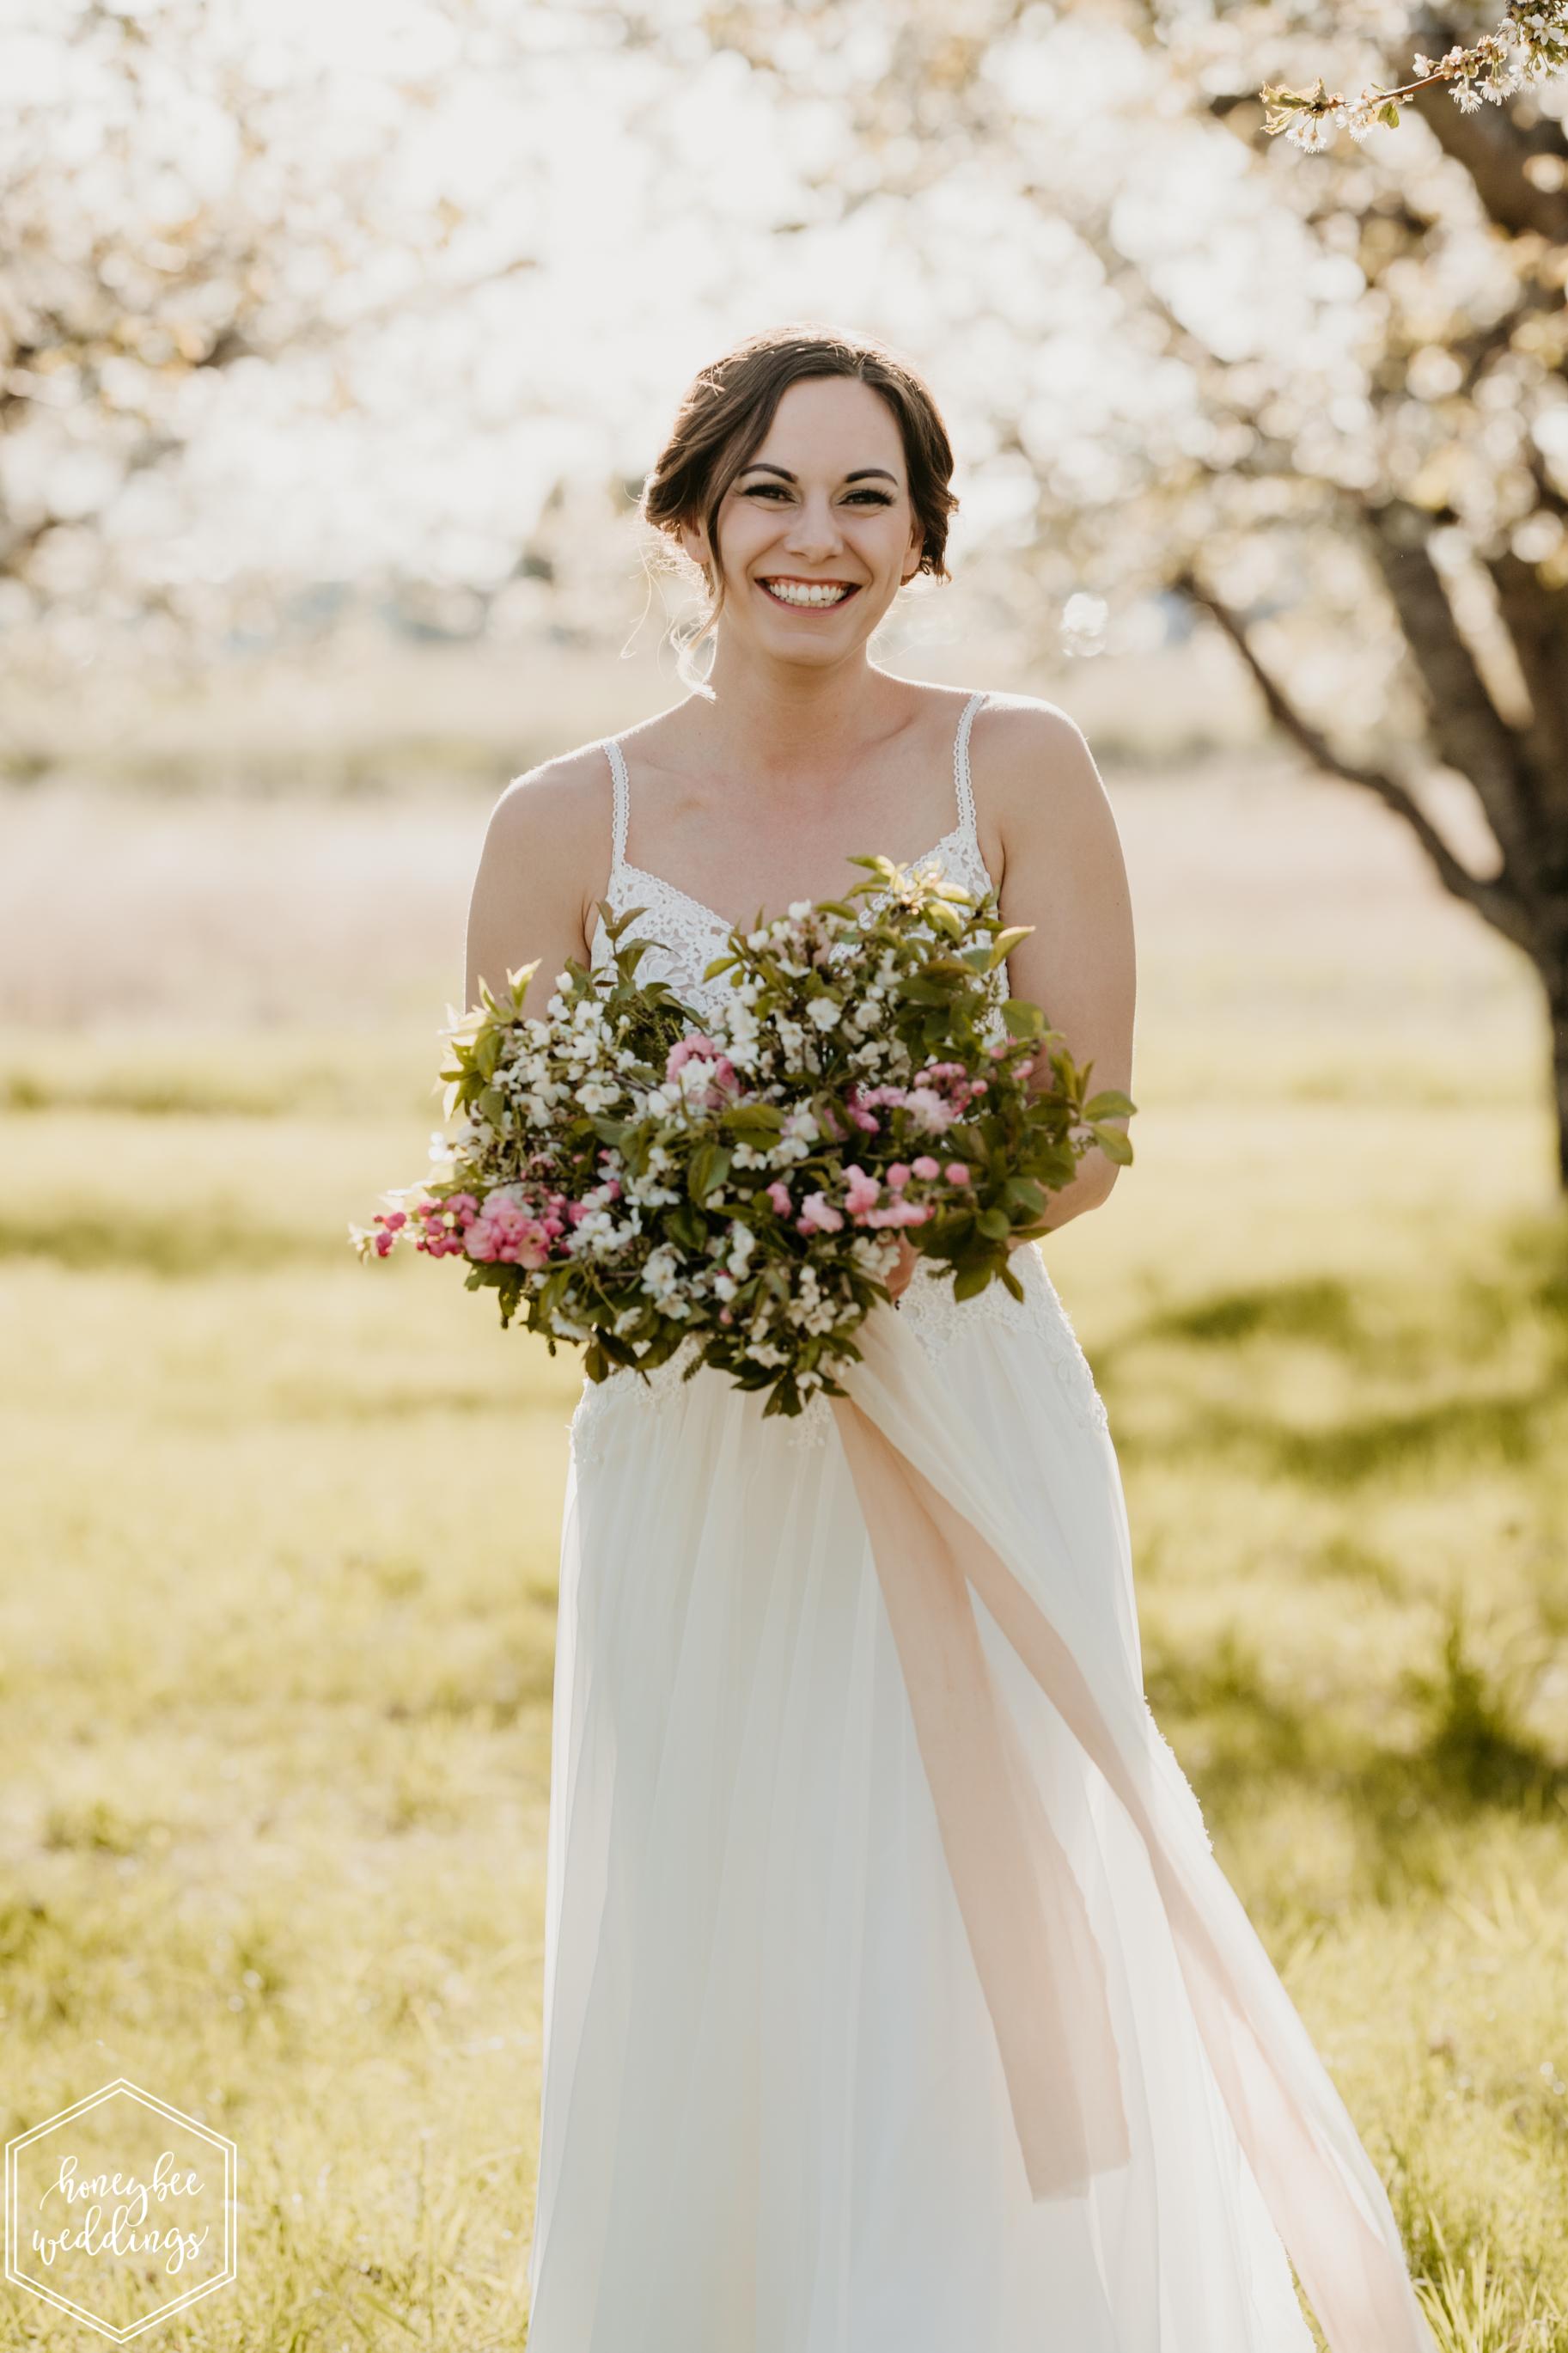 029Cherry Blossom Wedding_Styled Photoshoot_Honeybee Weddings_May 11, 2019-340.jpg